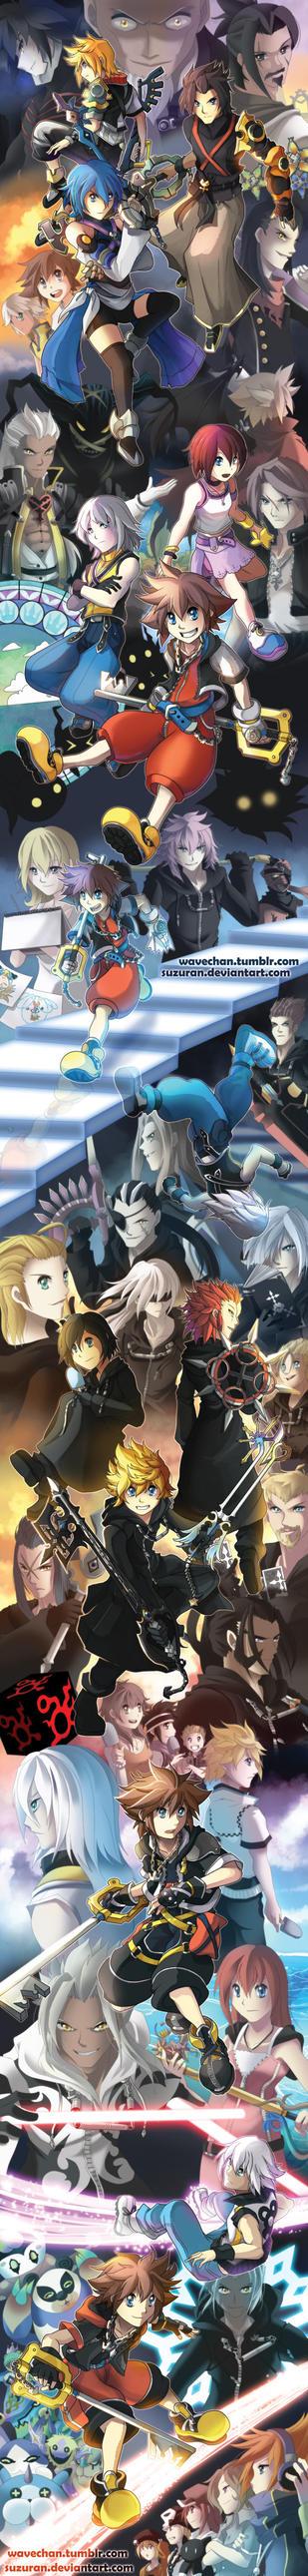 SUPER LONG Kingdom Hearts tribute by suzuran